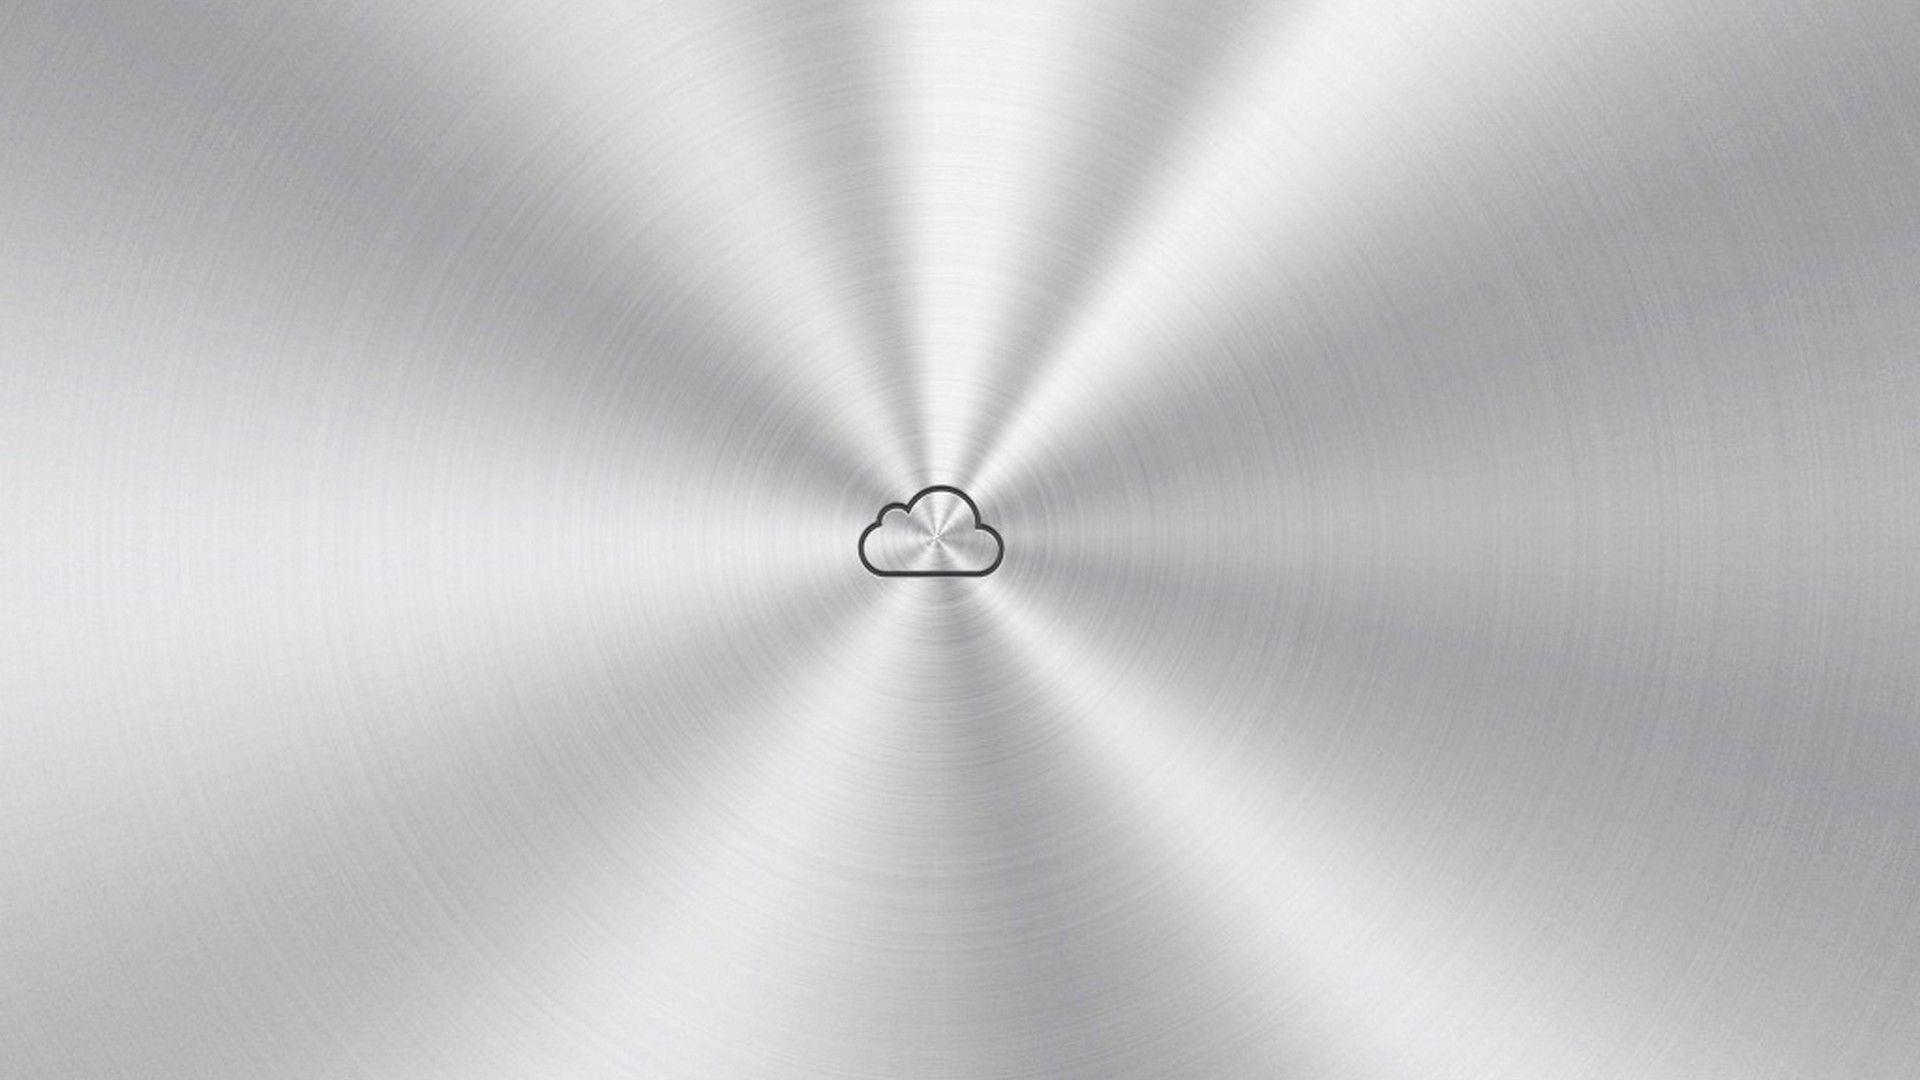 Silver Metallic Desktop Wallpaper Desktop wallpaper